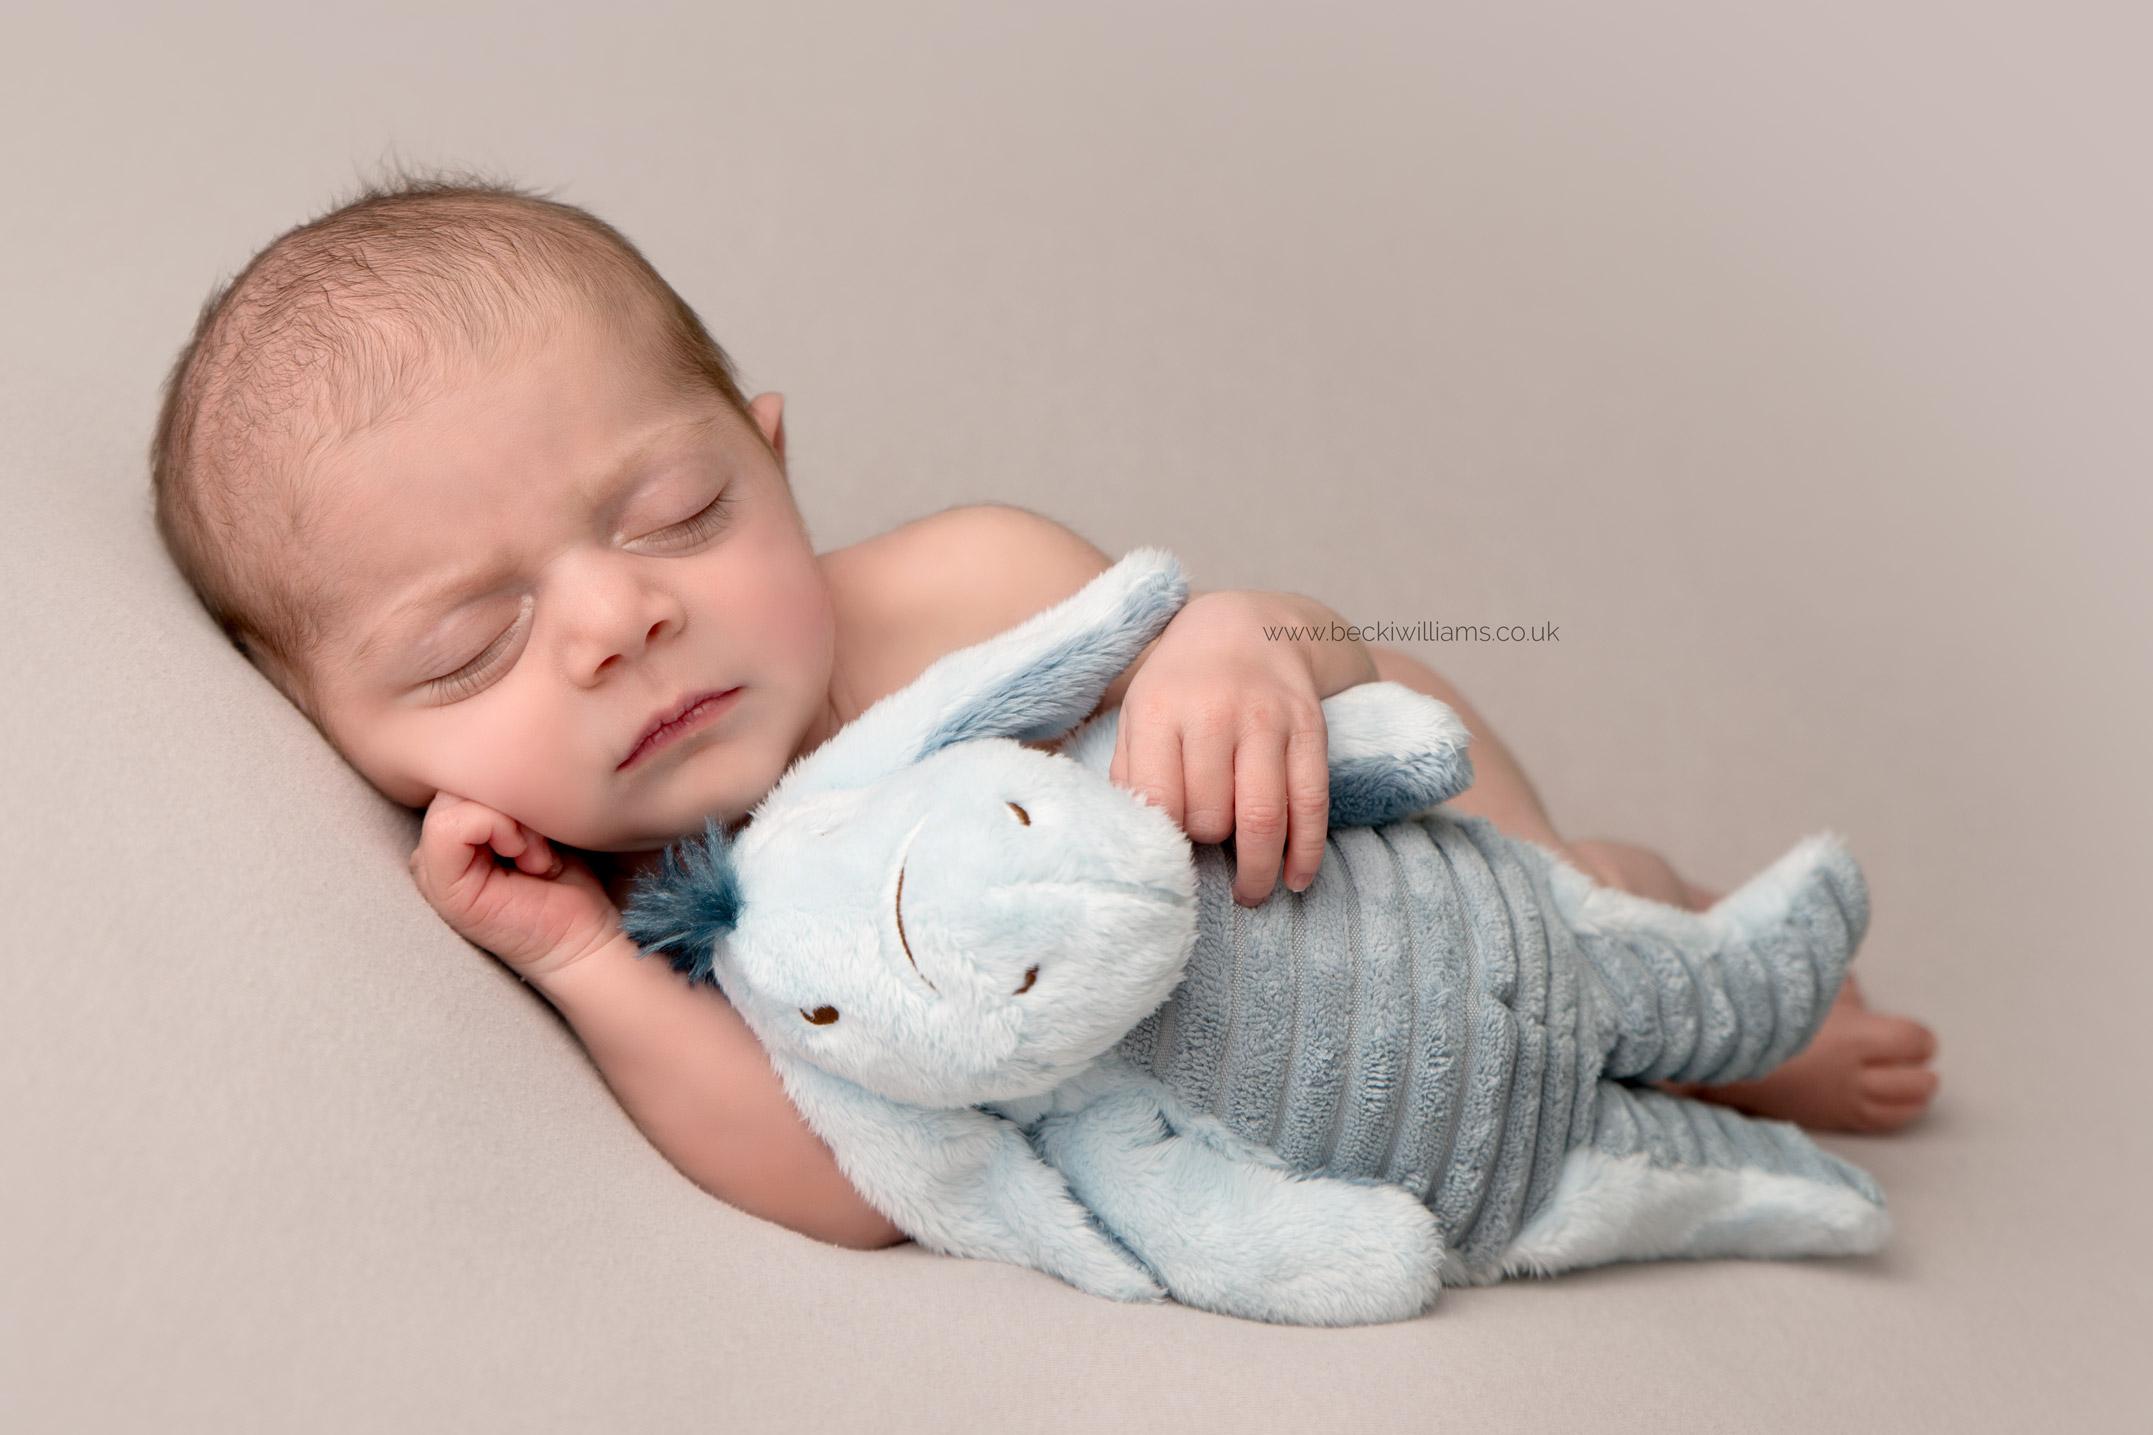 a baby girl asleep on her side cuddling a toy eeyore at her newborn photo shoot in hemel hempstead